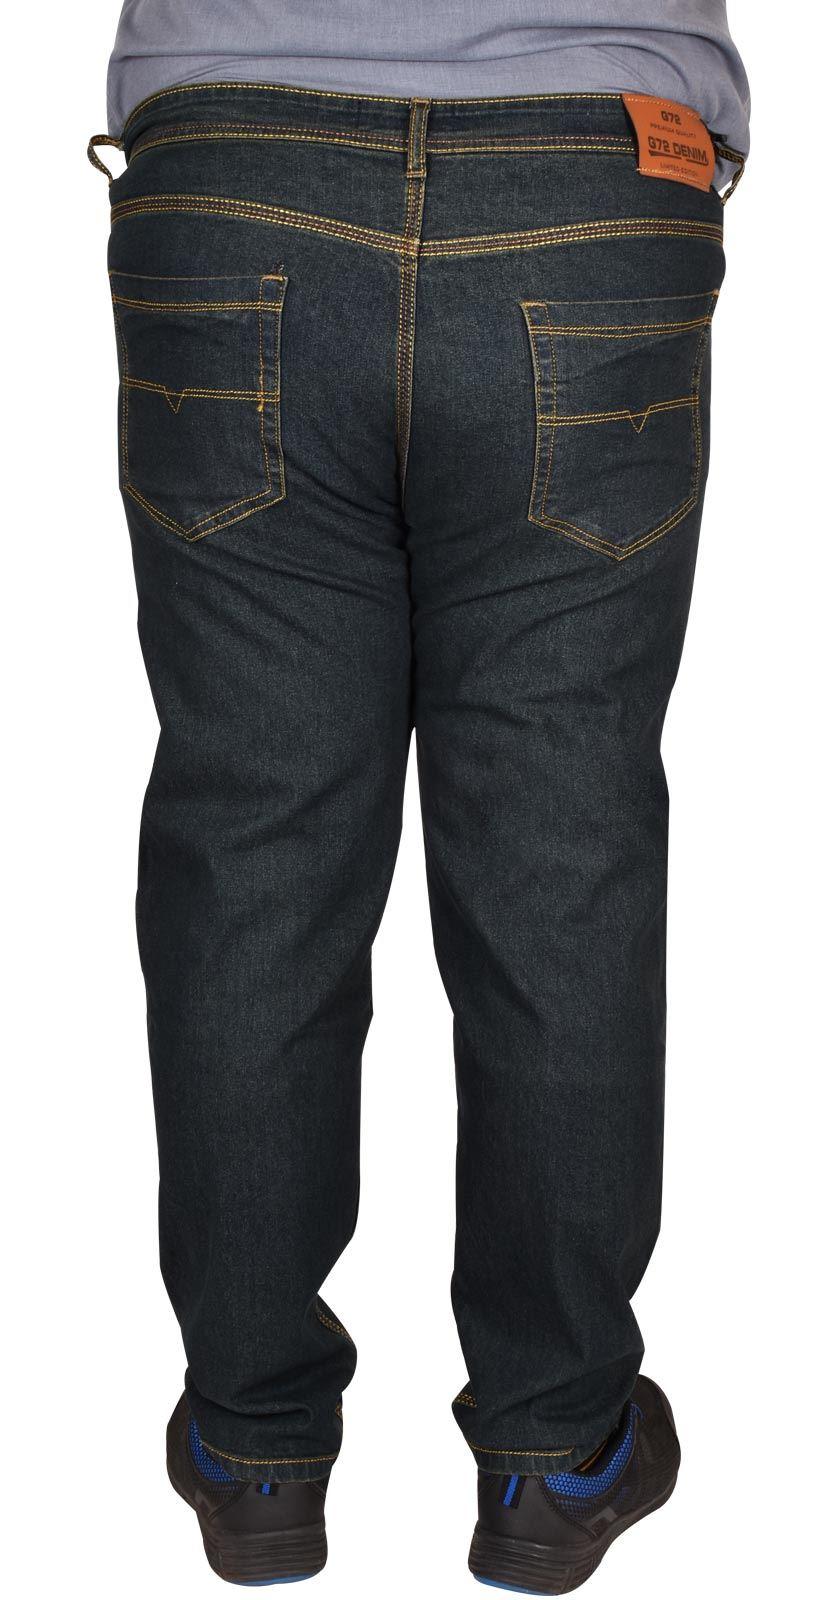 Men-Jeans-Straight-Leg-Stretch-Denim-Trouser-Pants-All-Waist-Big-Tall-King-Sizes thumbnail 4